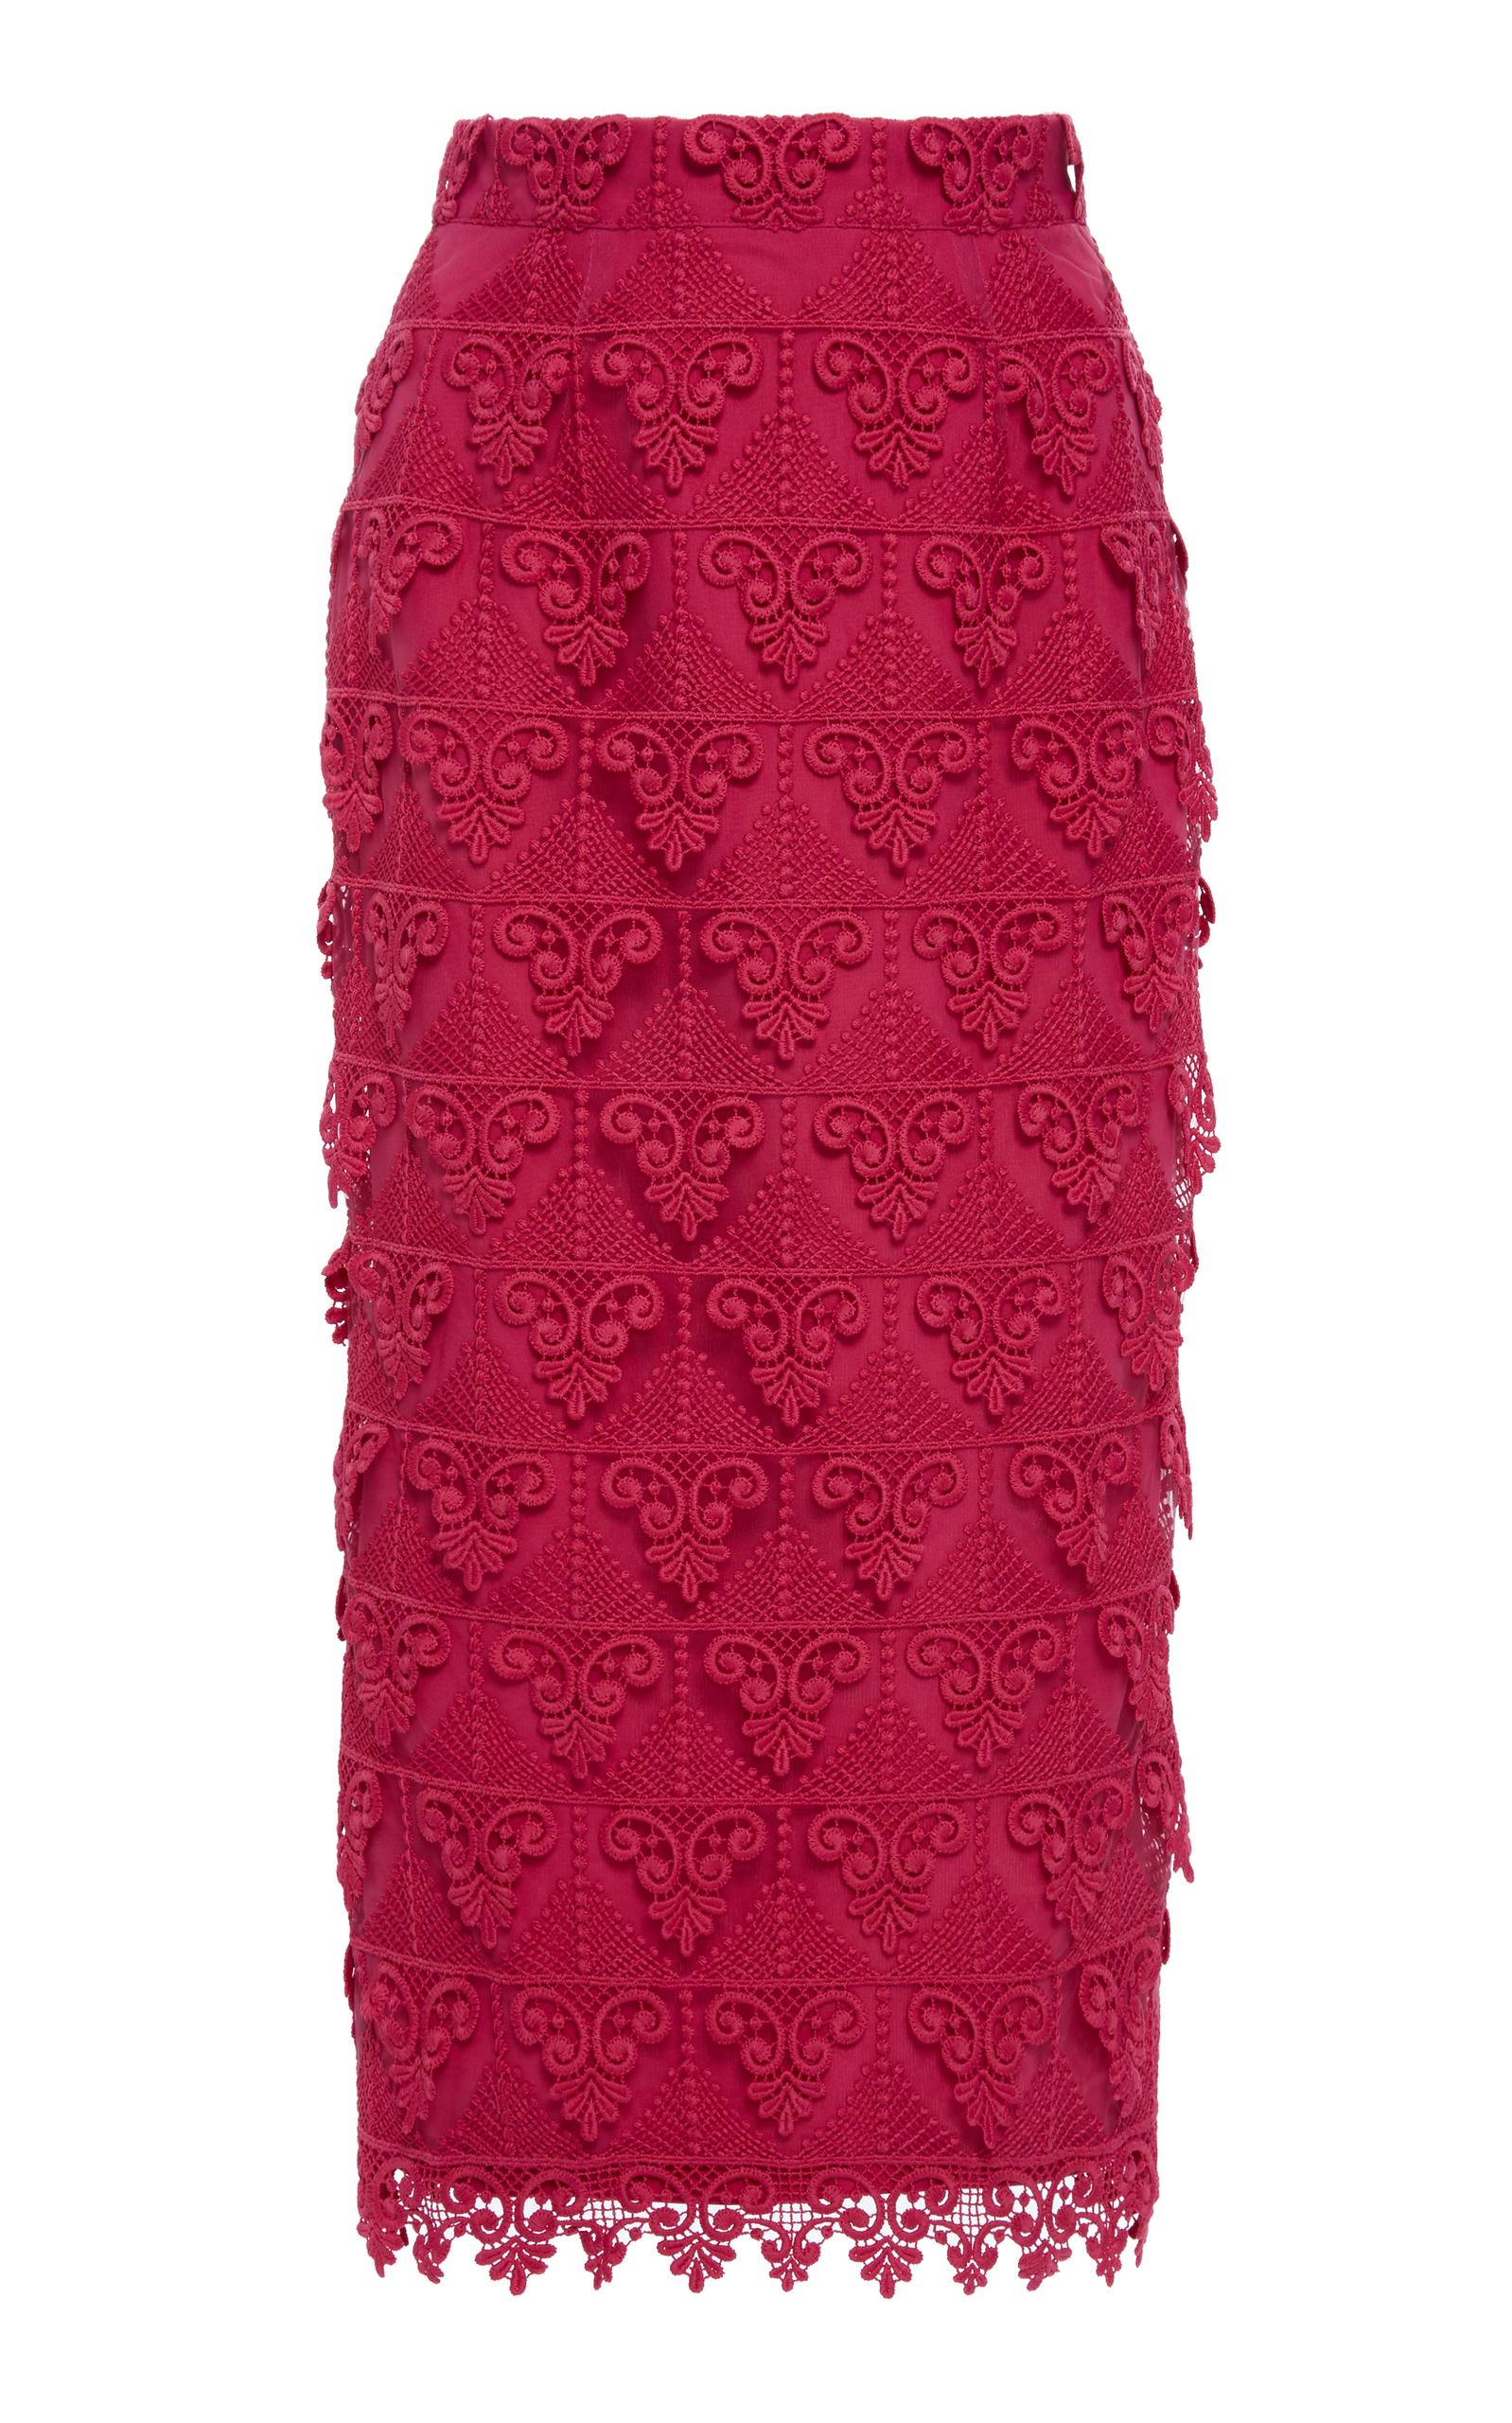 ALCOOLIQUE Araka Tubolar Skirt in Pink